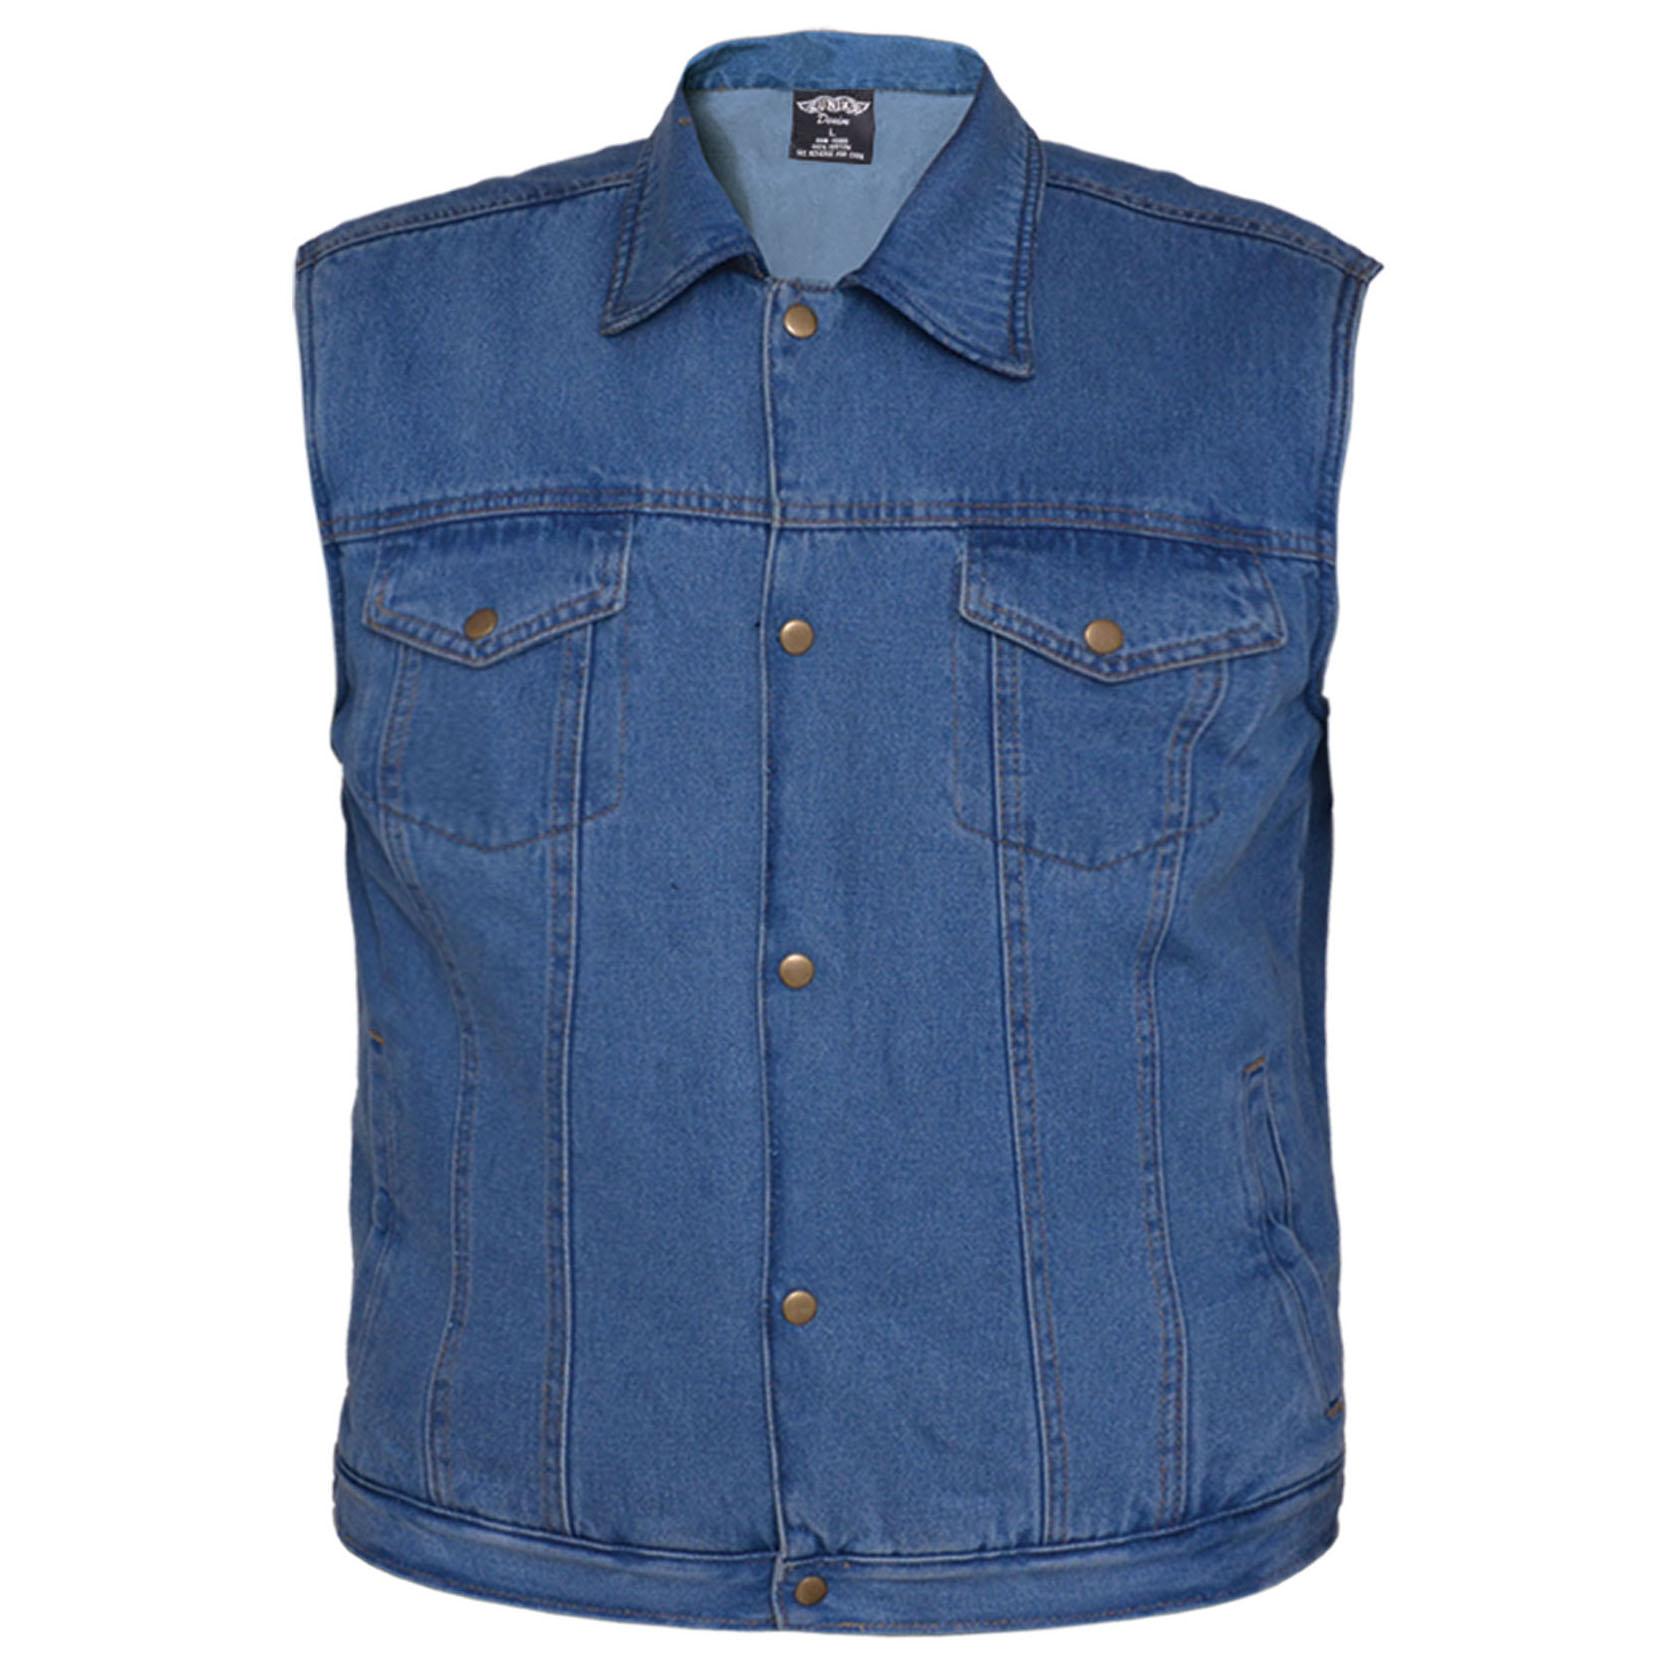 Denim Vest by Revolution Gear/Unik Leather- WORN BLUE